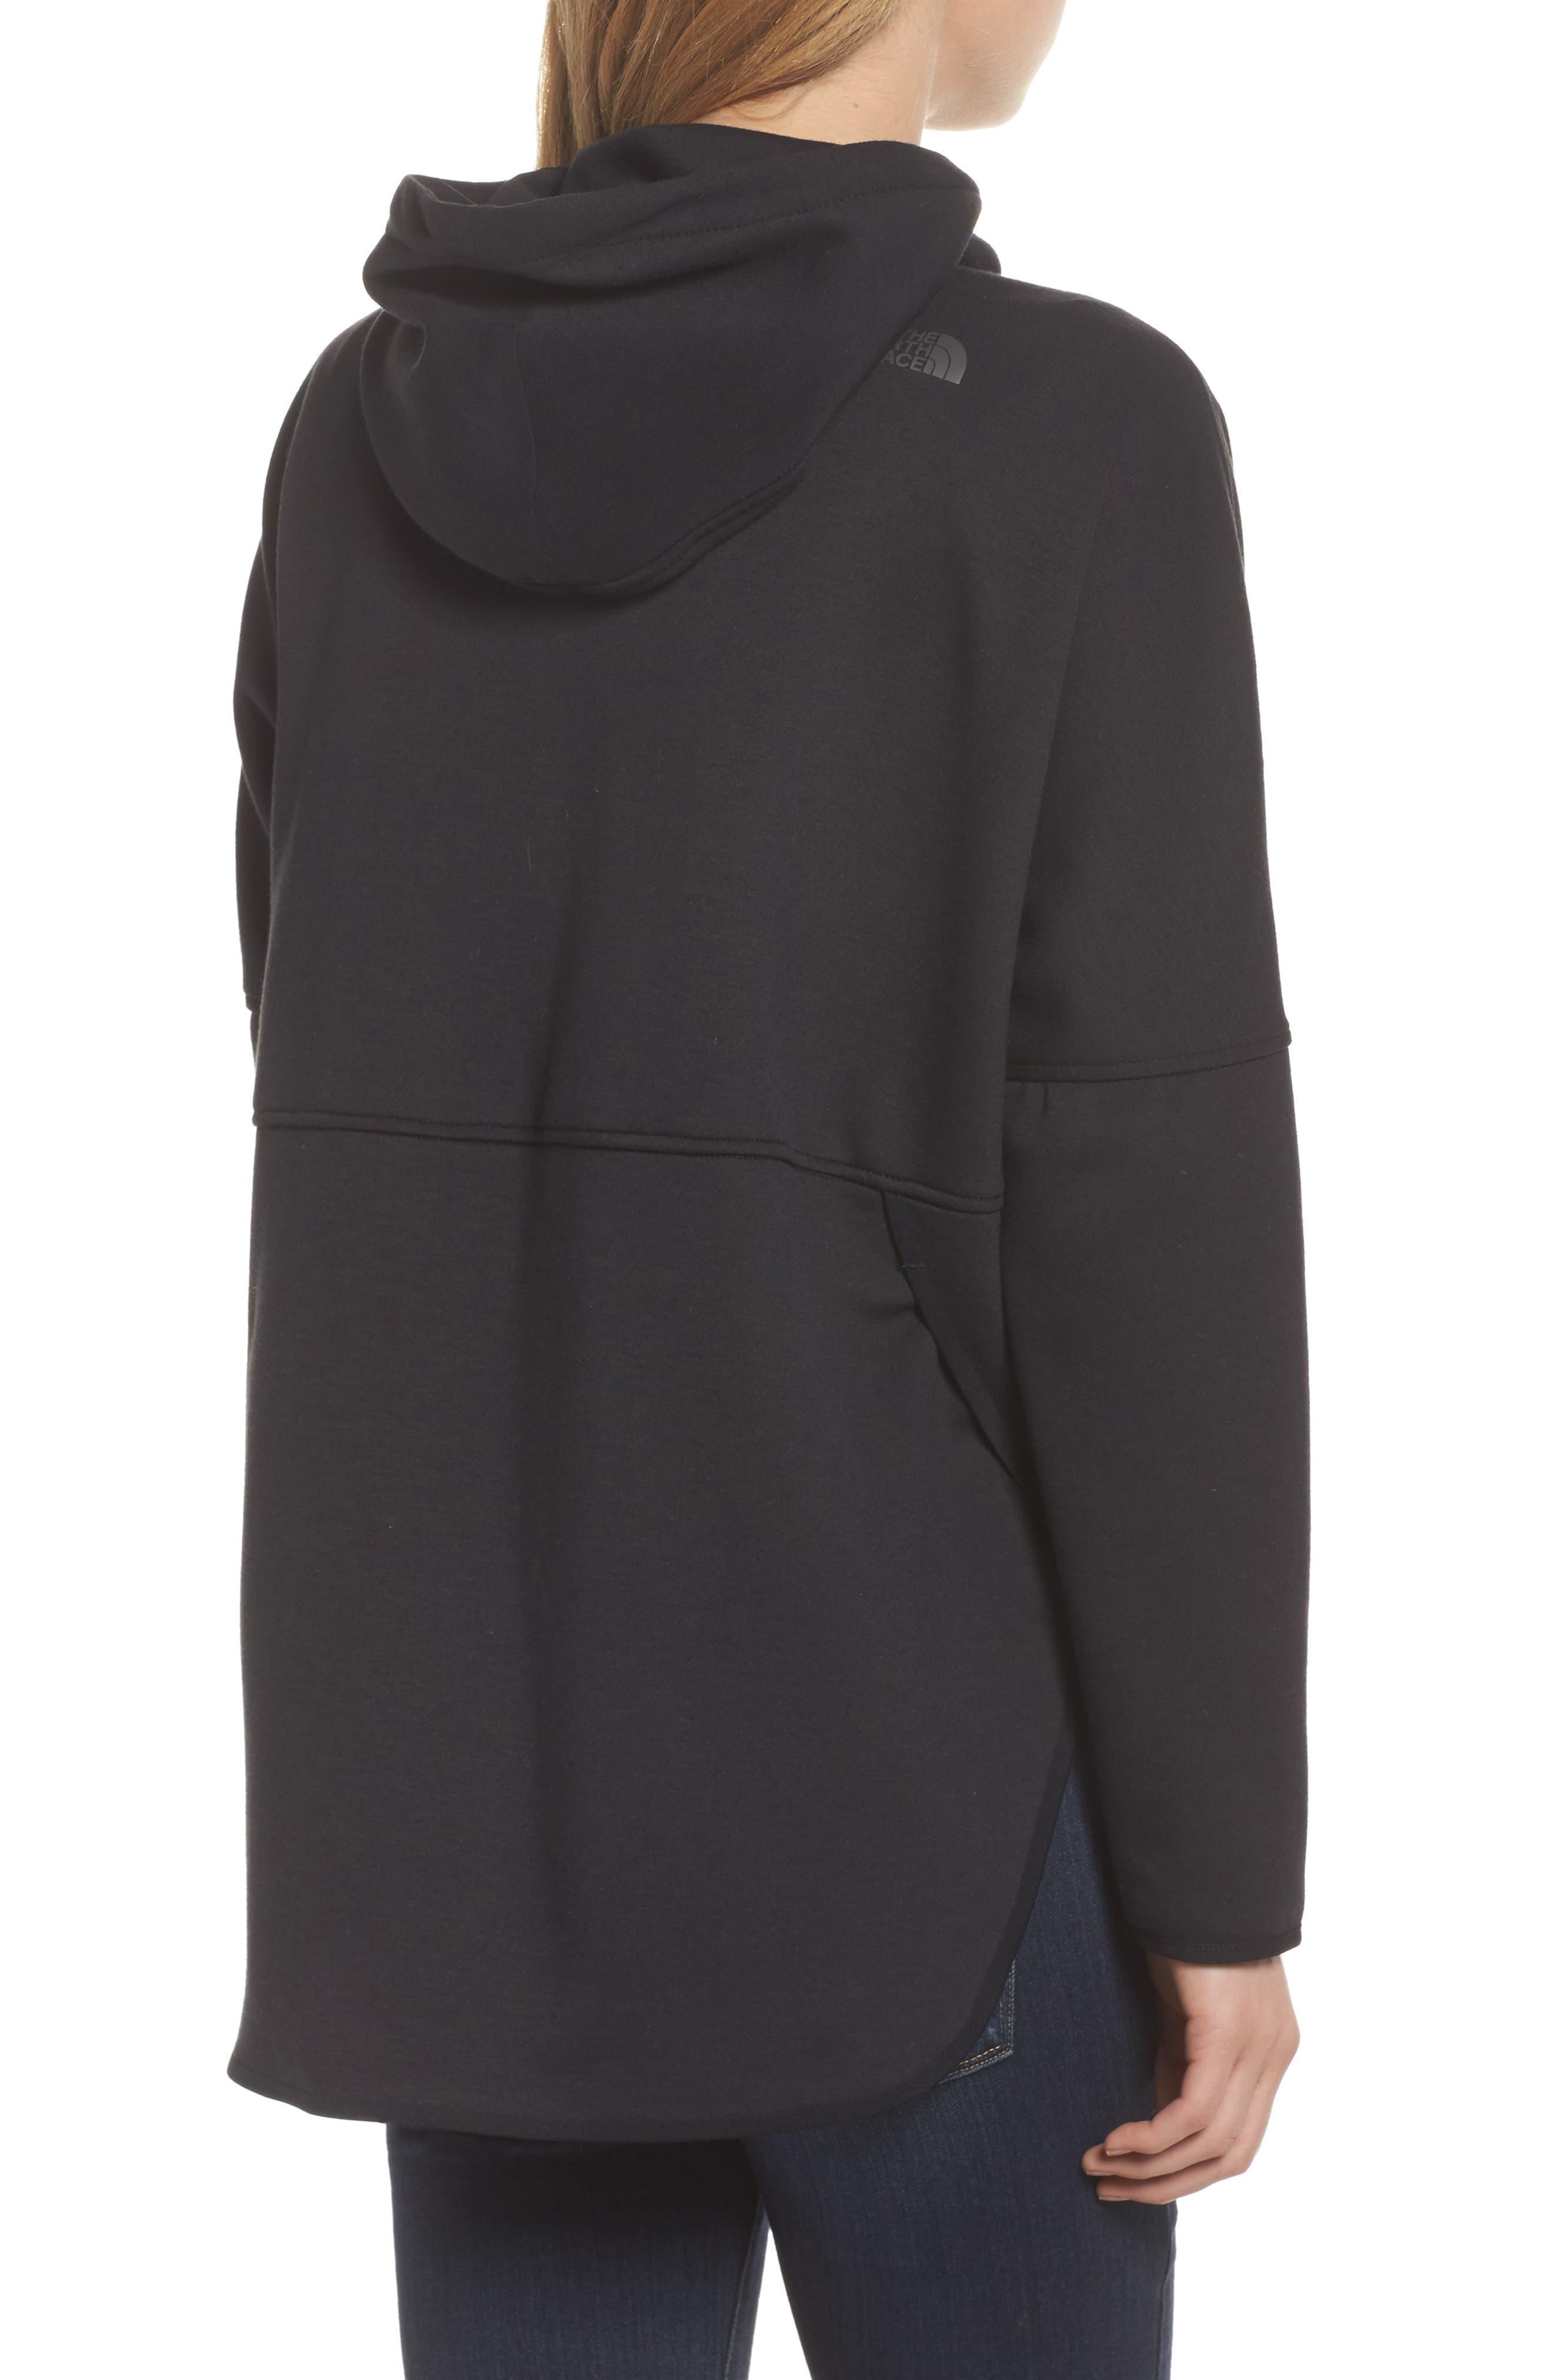 Slacker Hooded Jacket,                             Alternate thumbnail 2, color,                             Tnf Black